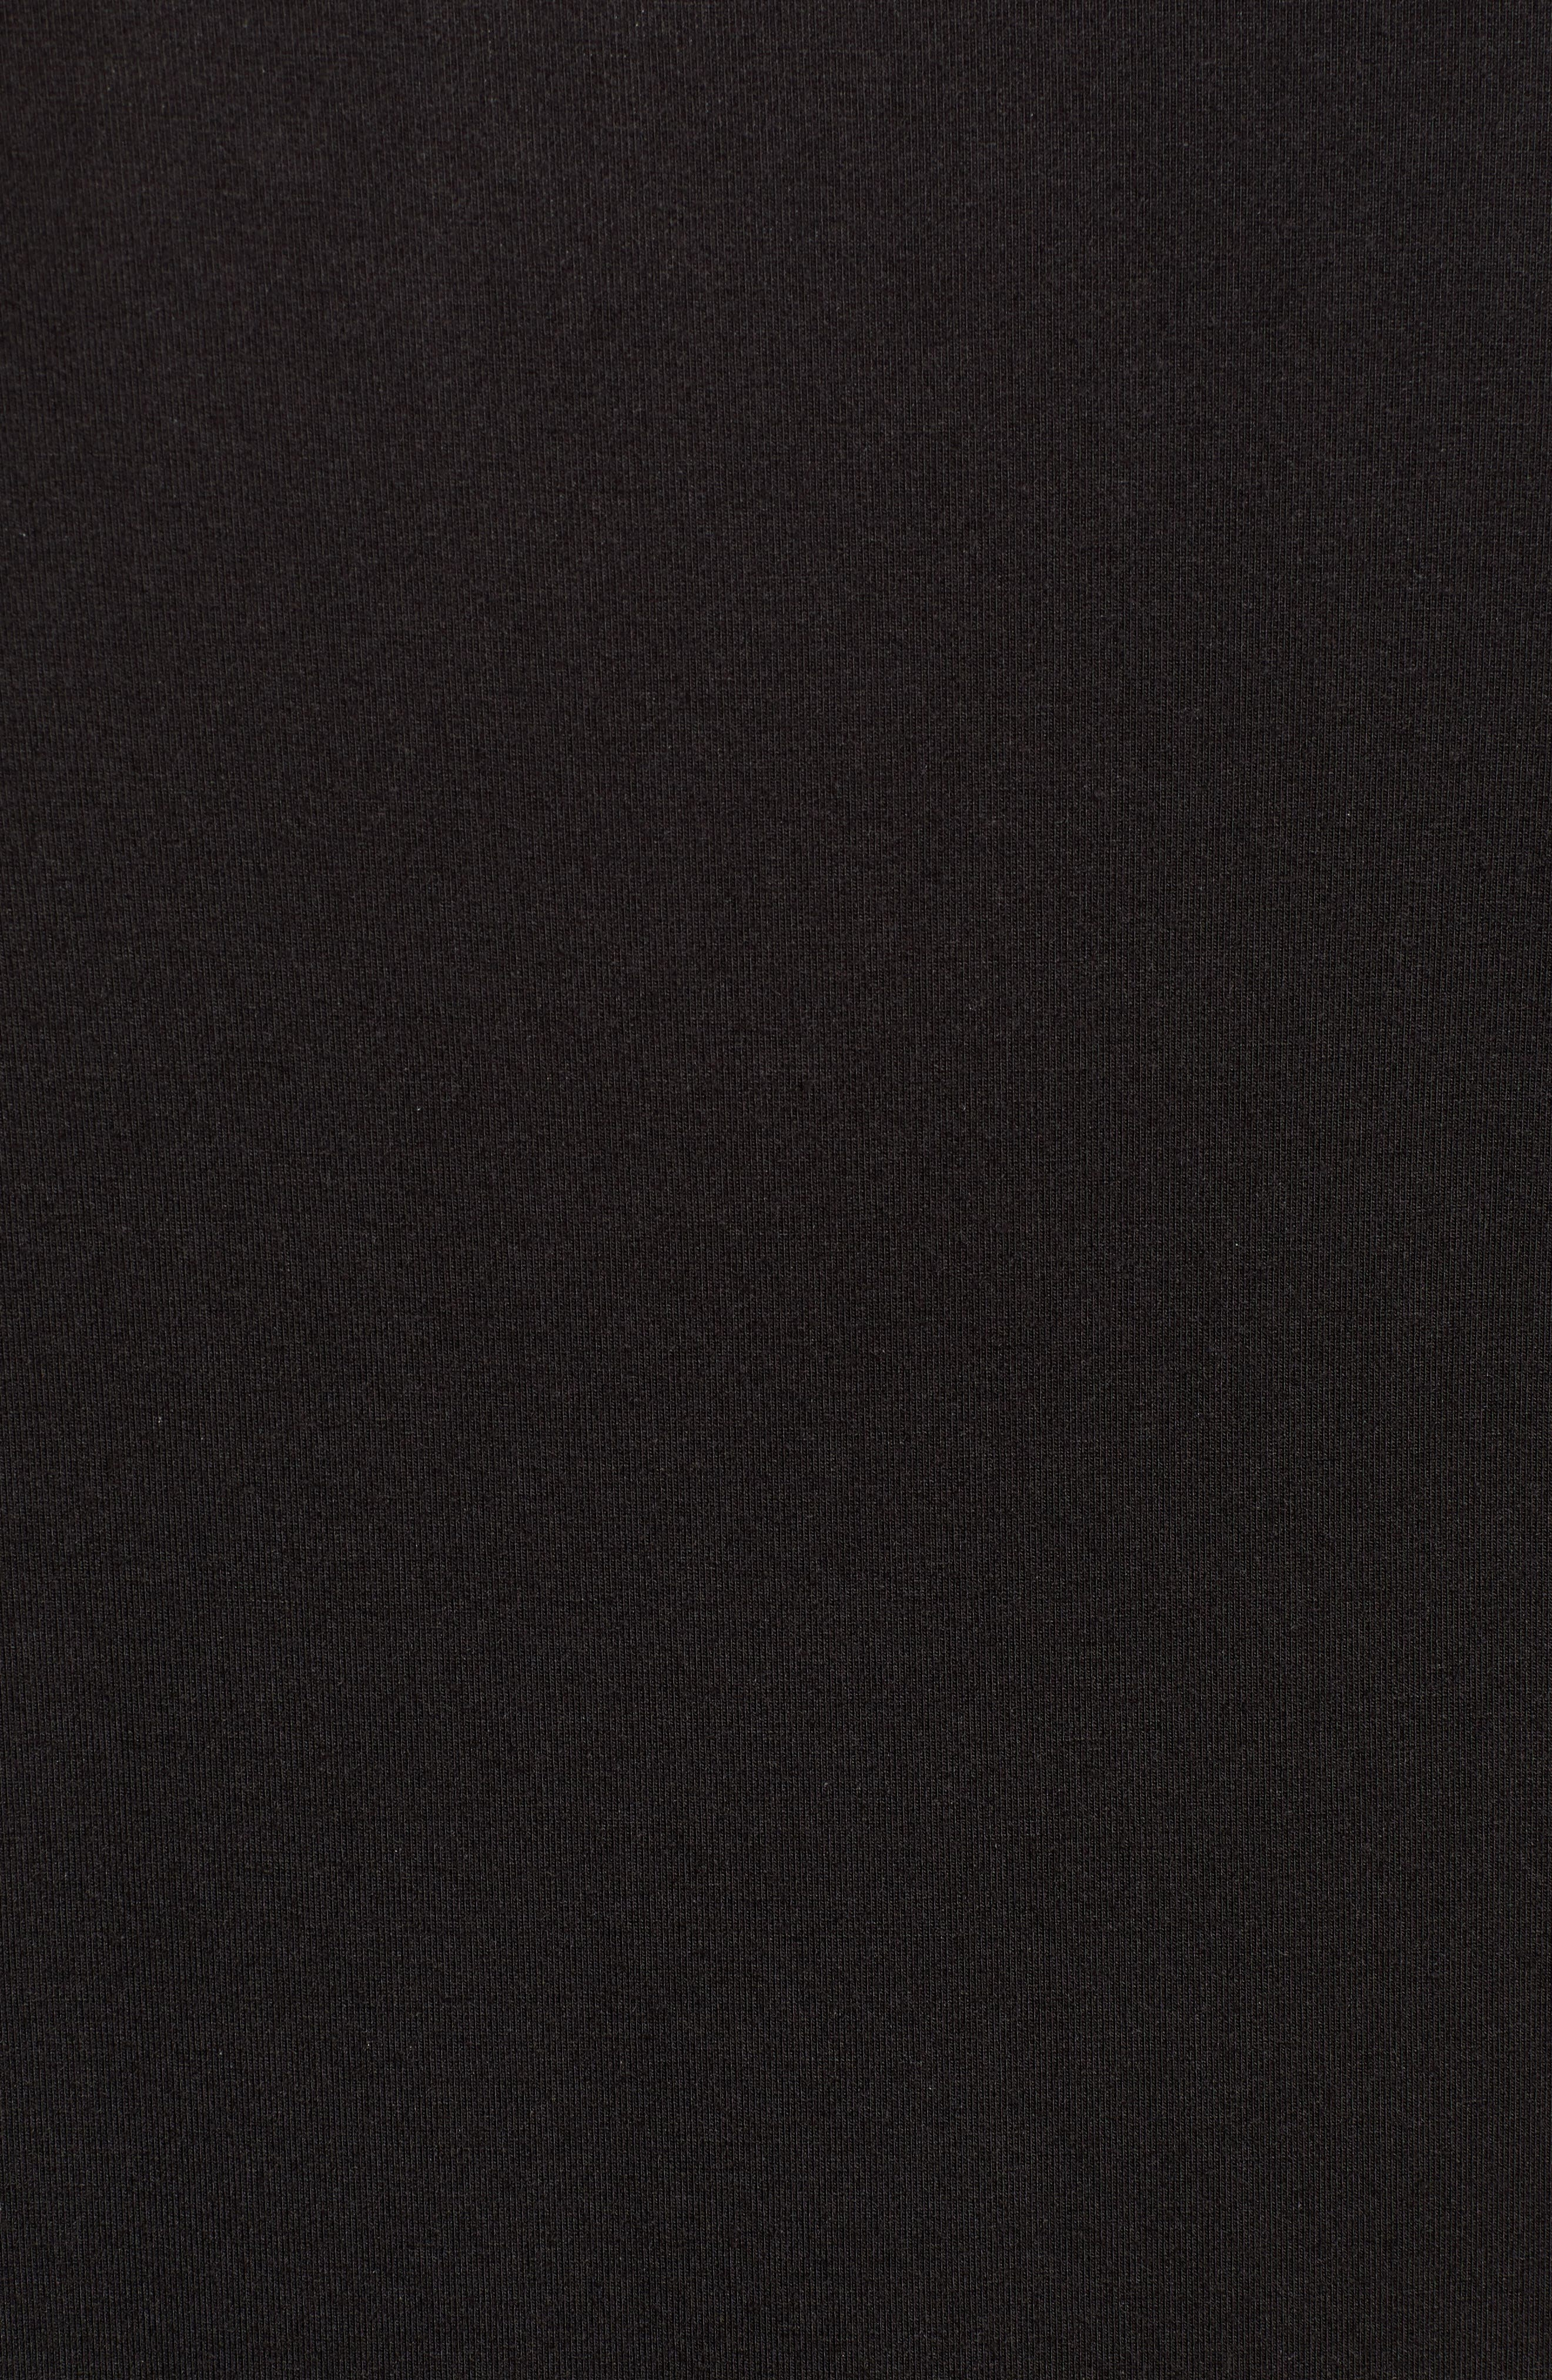 Short Sleeve Stretch Modal Henley,                             Alternate thumbnail 5, color,                             BLACK